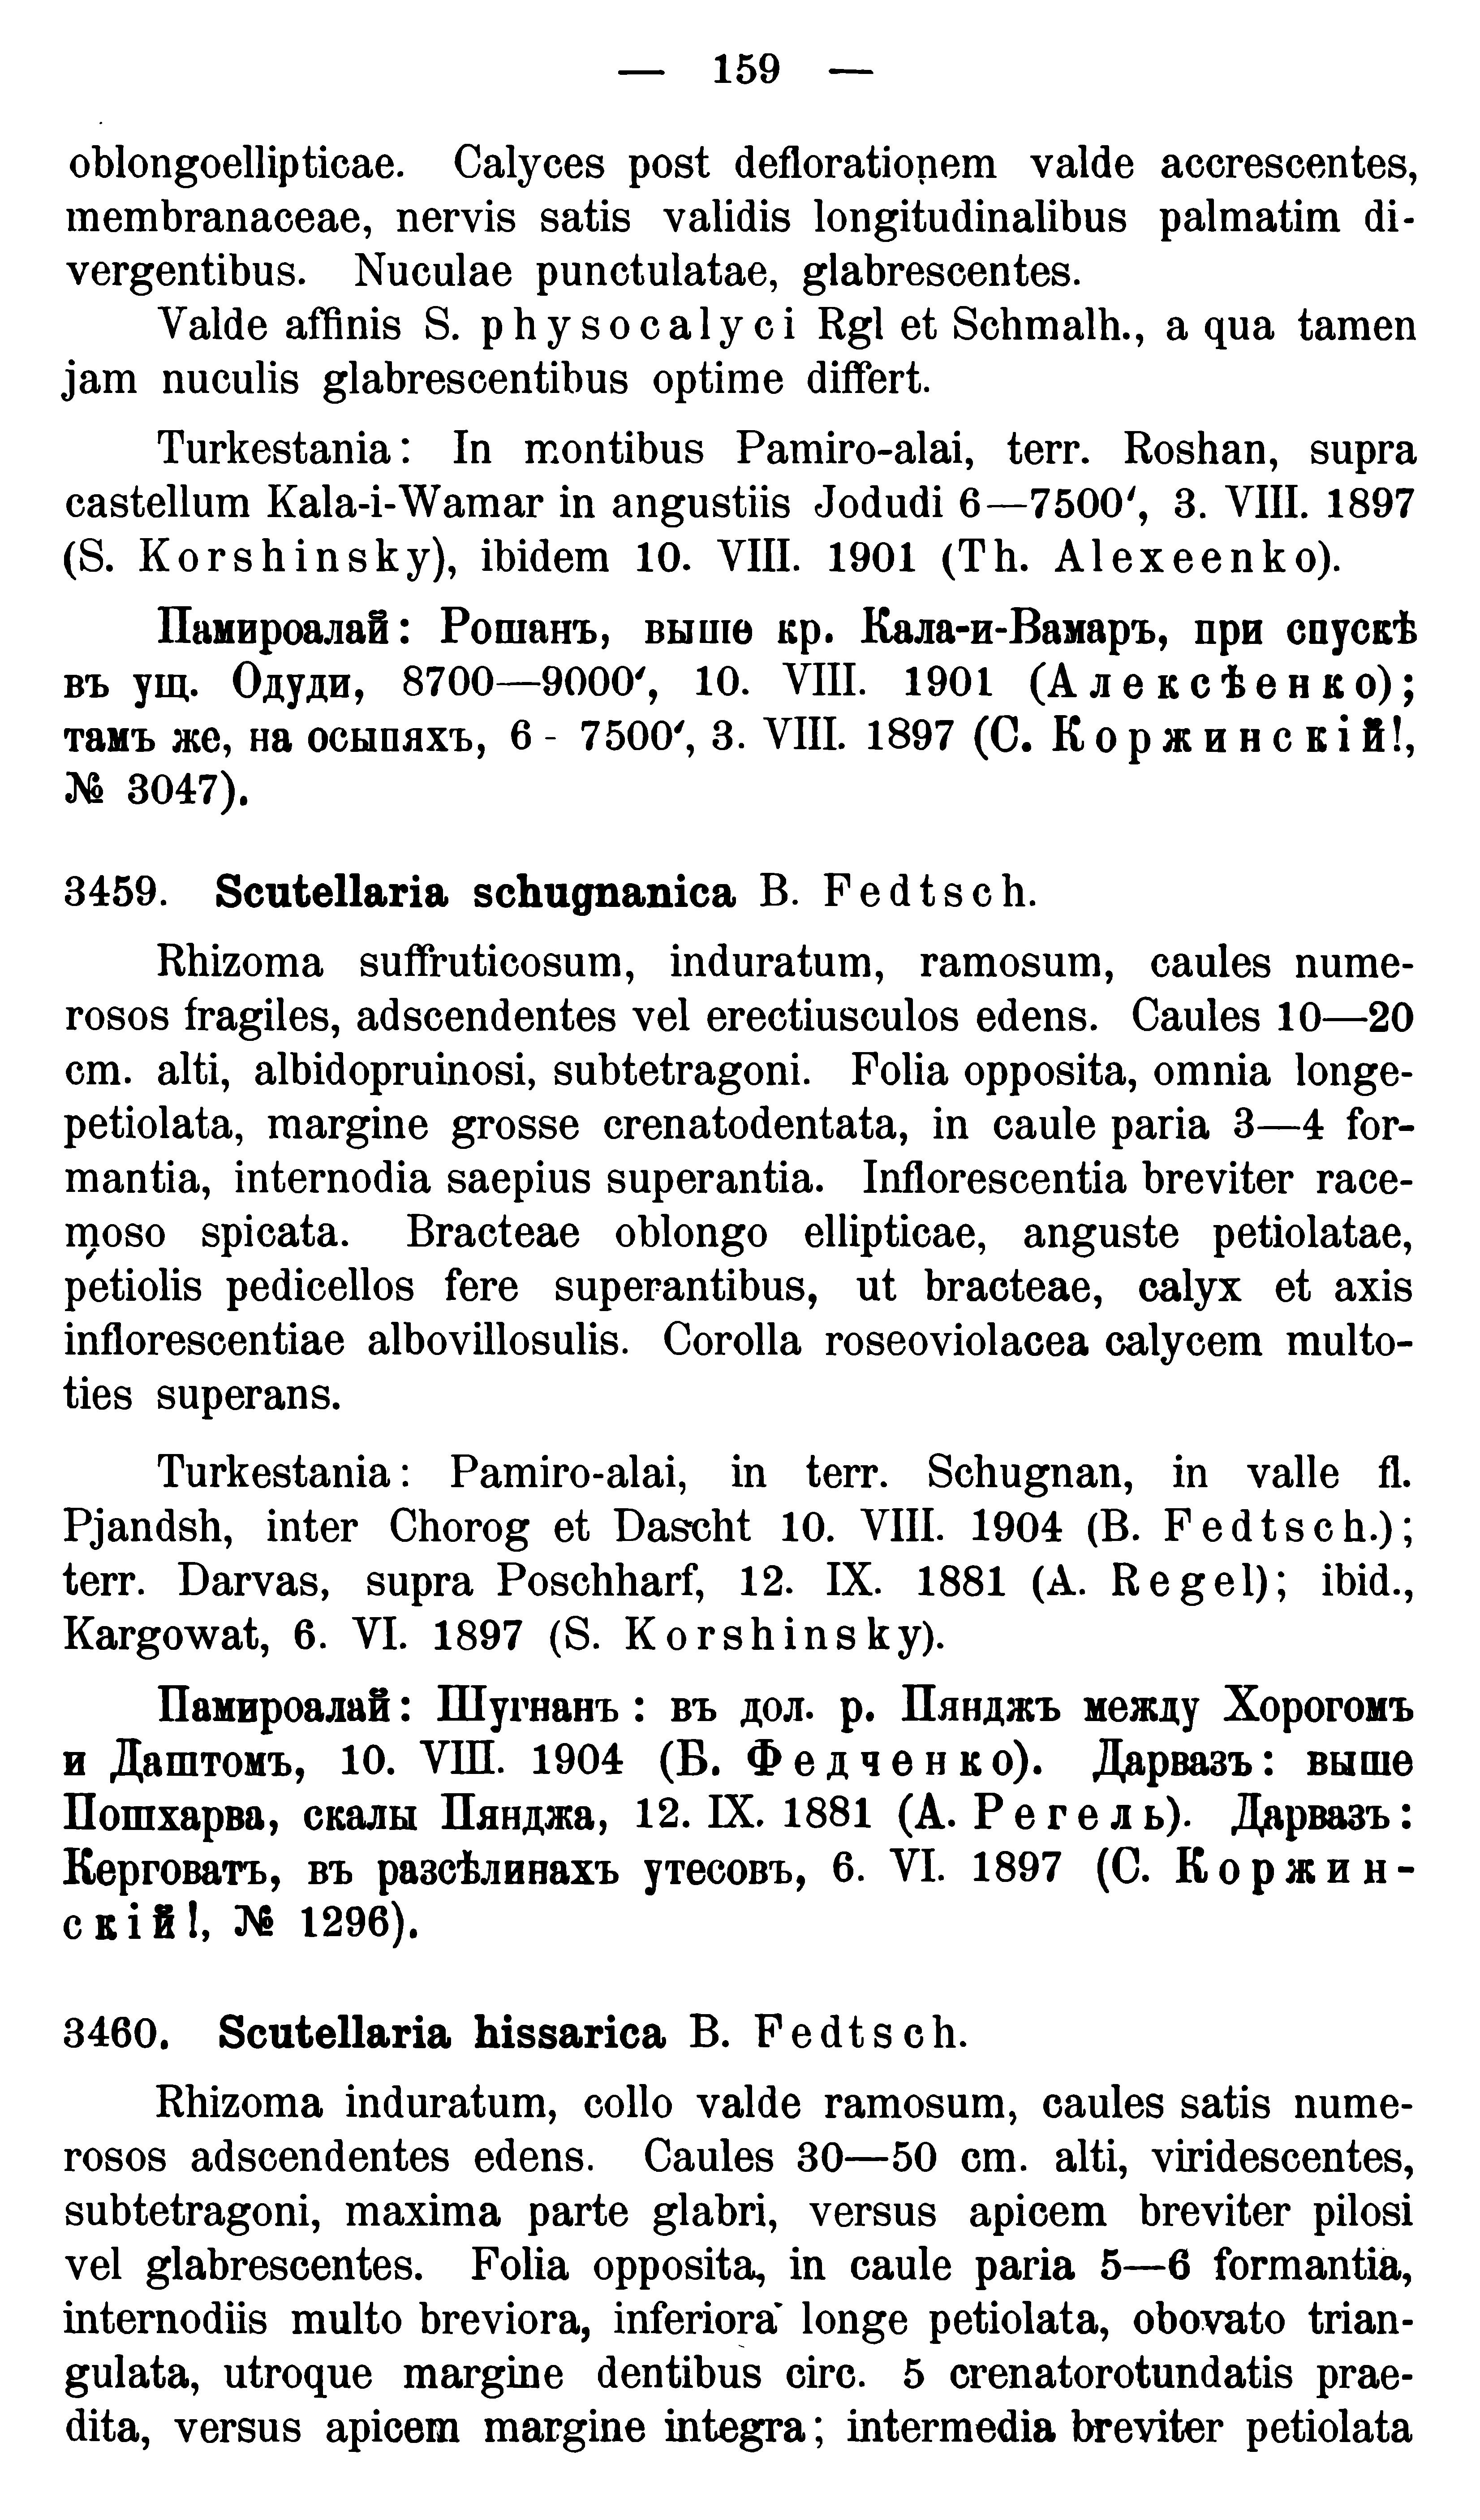 https://forum.plantarium.ru/misc.php?action=pun_attachment&item=26629&download=0